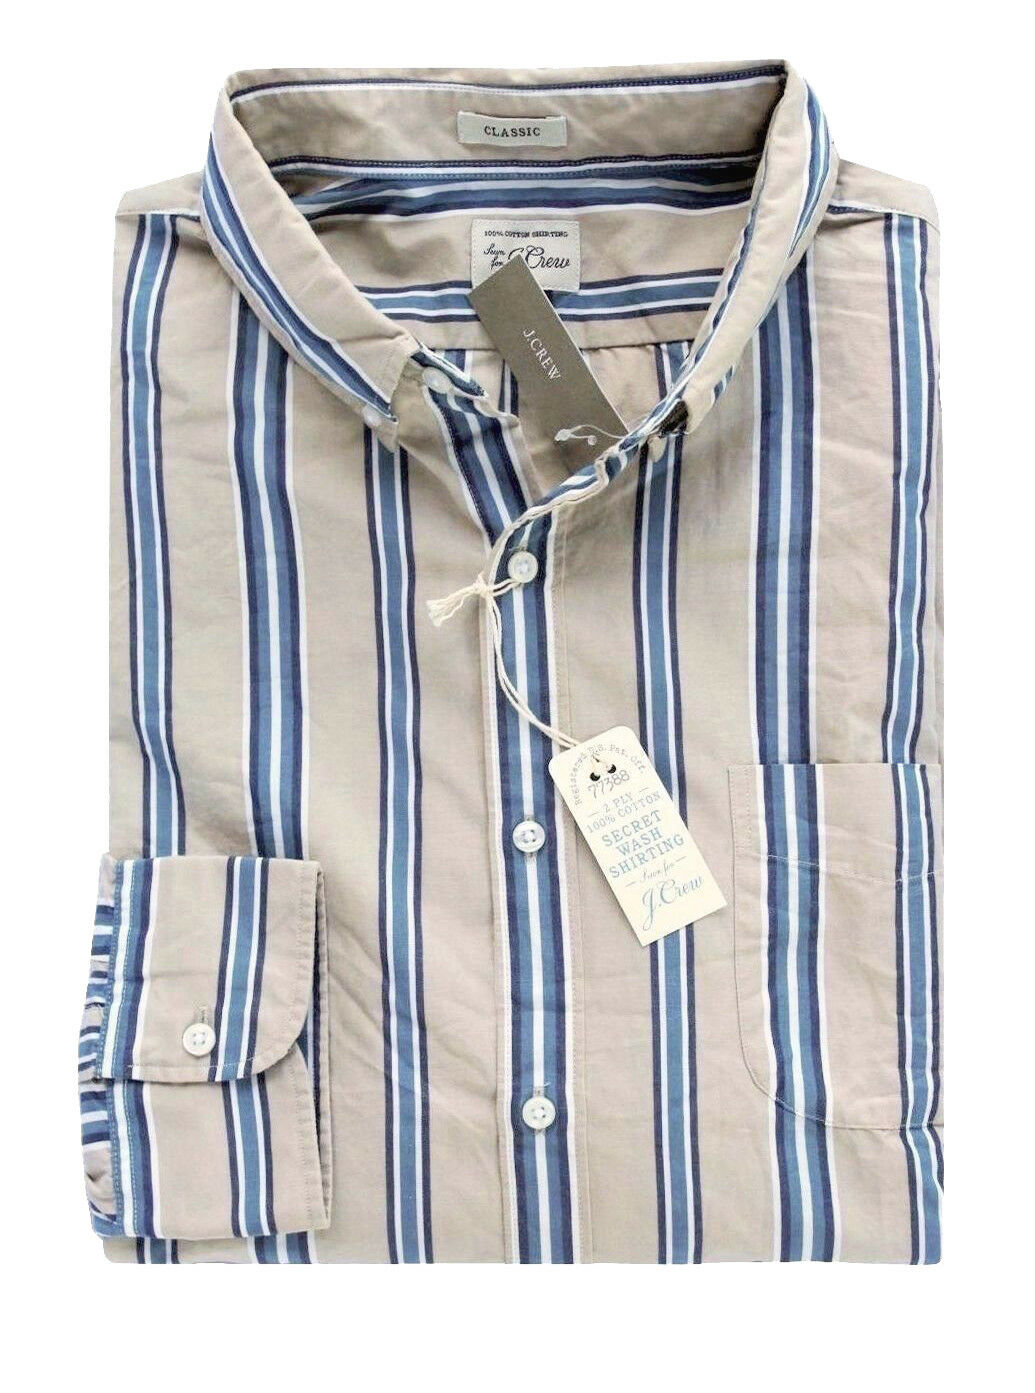 J.Crew - Men's XS - Classic Fit - NWT - Khaki bluee Striped Secret Wash Shirt